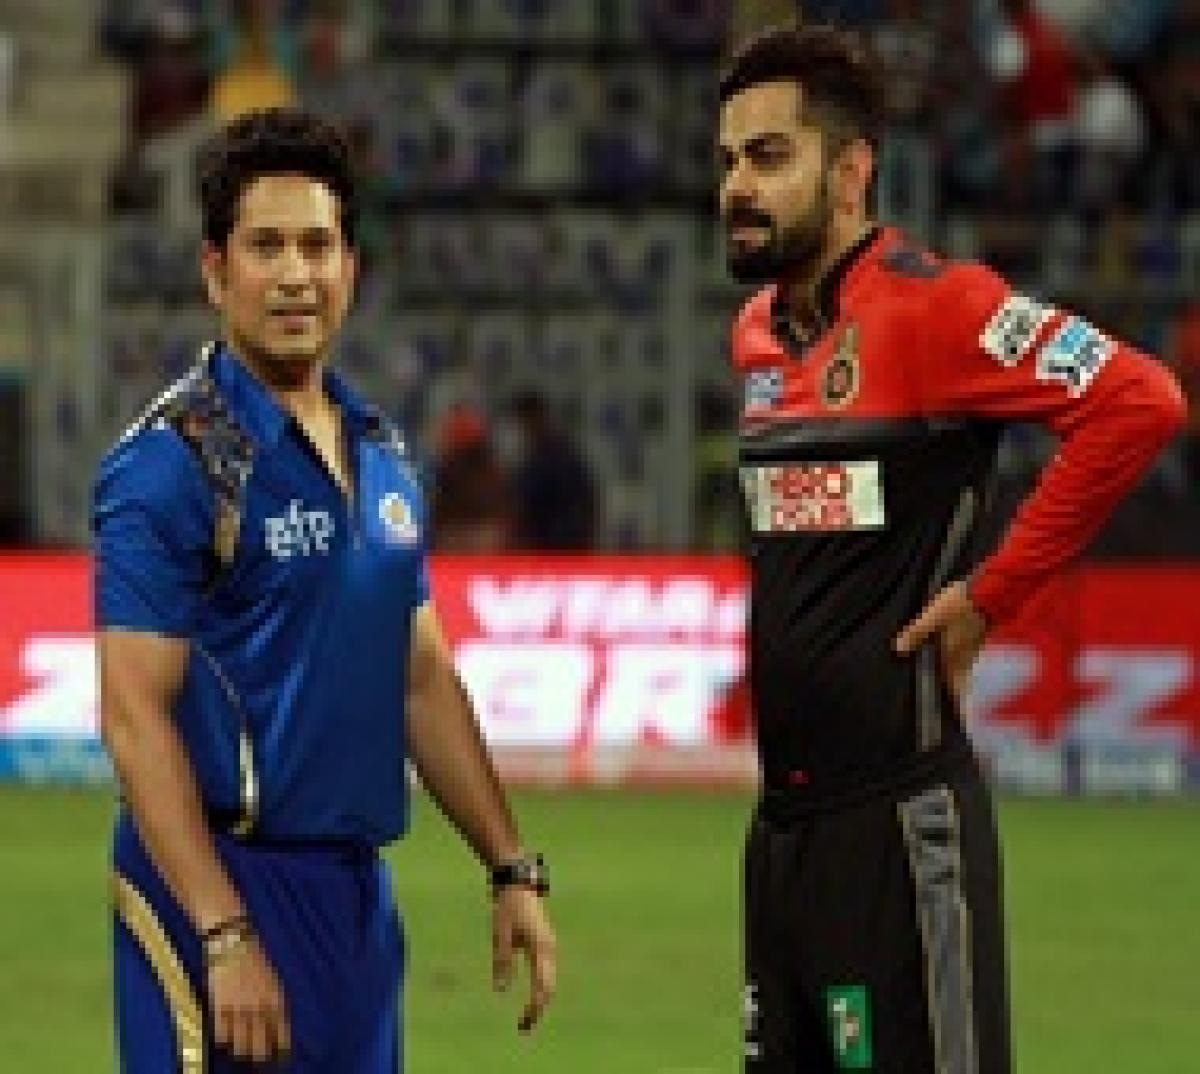 Kohli shouldn't be compared to Tendulkar: Sehwag